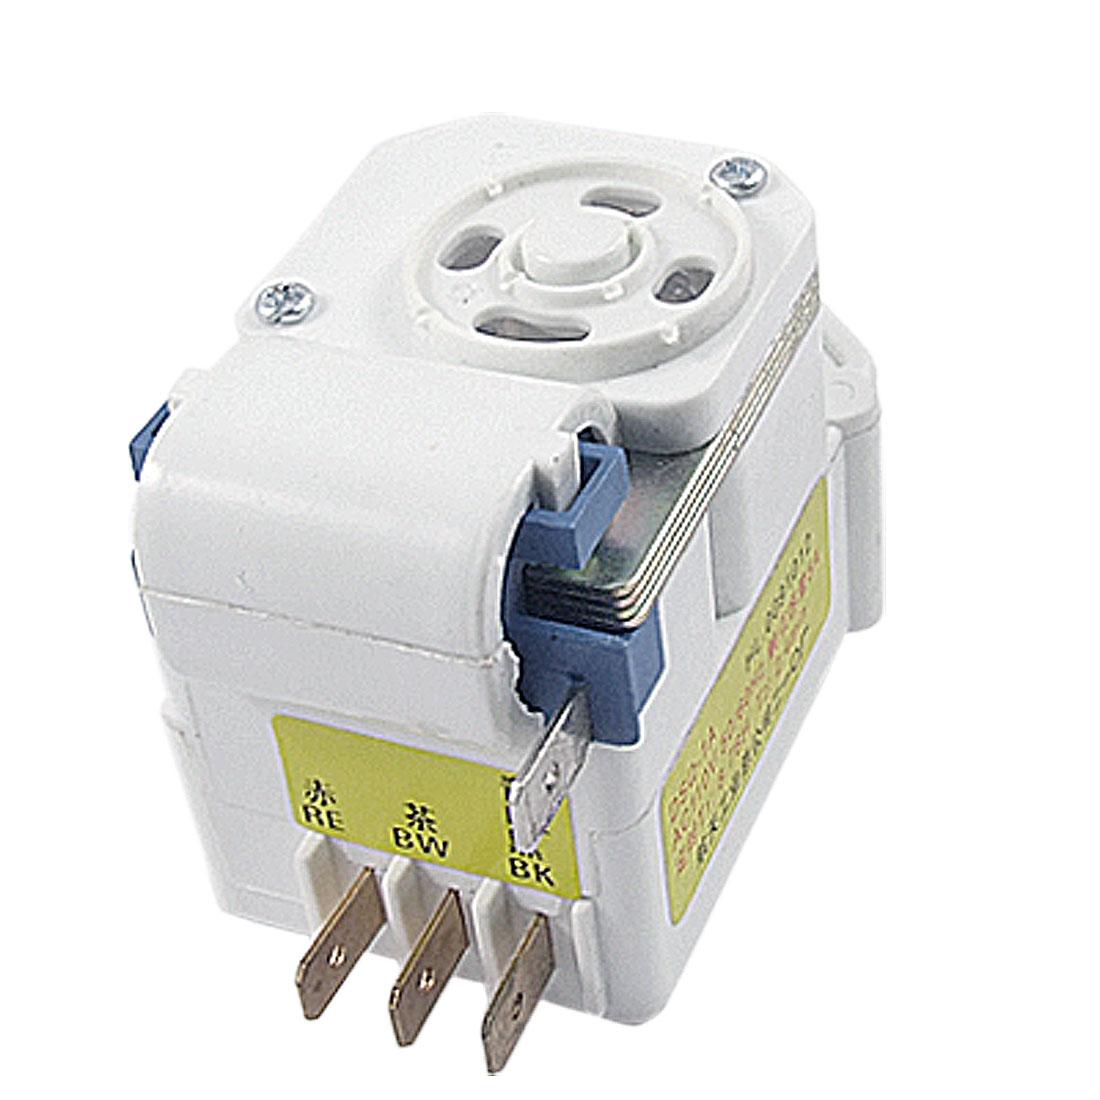 AC 110V DSQ-1A Terminals Refrigerator Fridge Defrost Timer